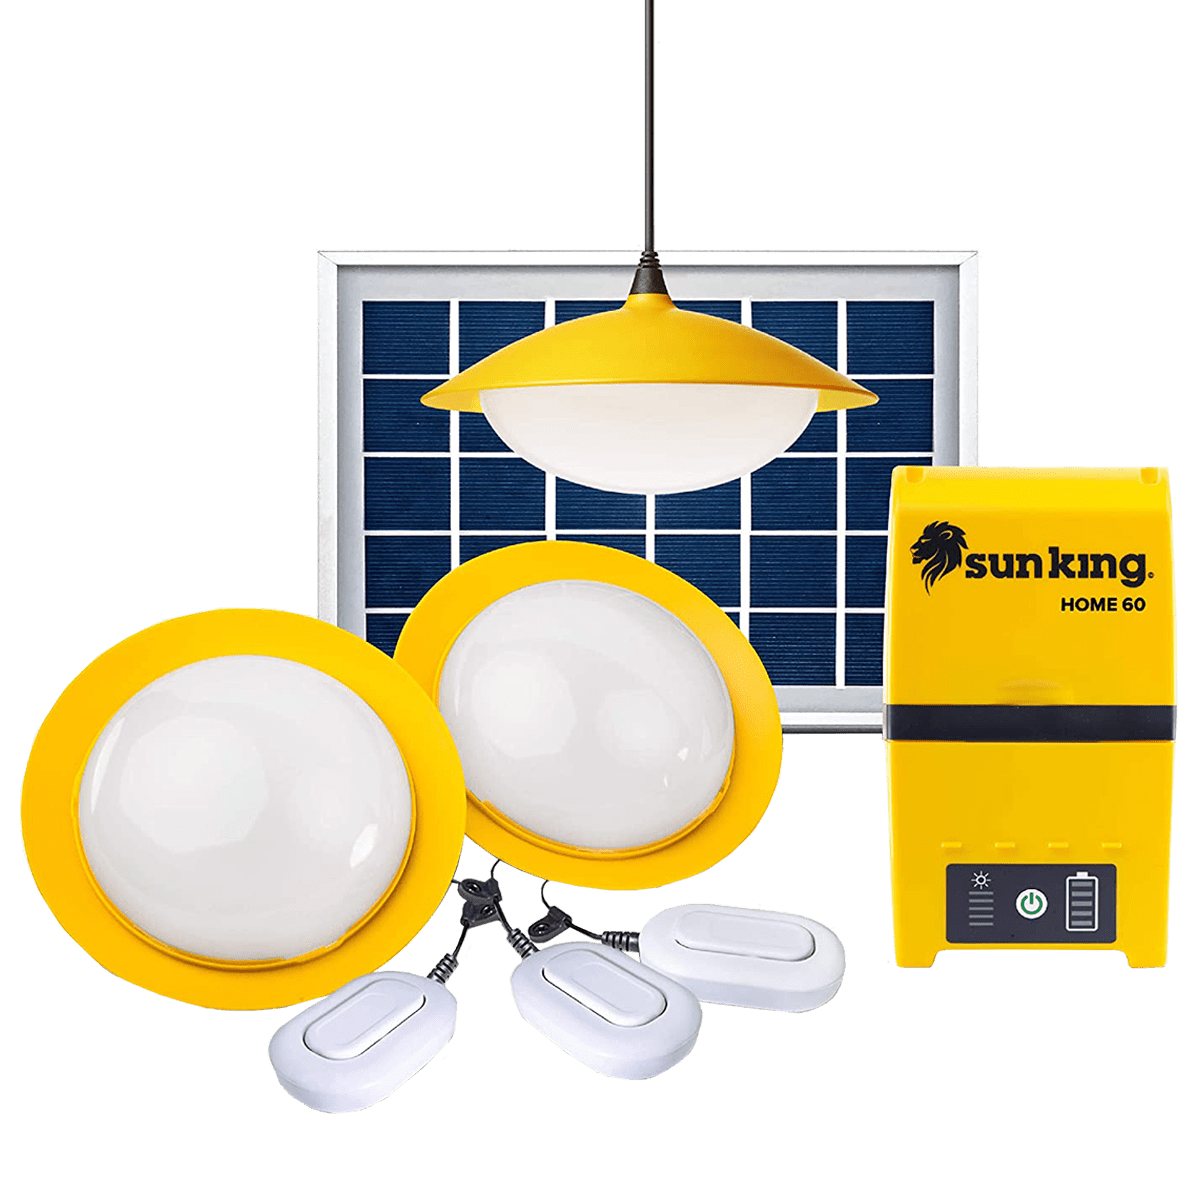 Sun King Home 60 2.1 Watts Solar Powered Pendant Light (300 Lumens, SK-403, Yellow/White)_1